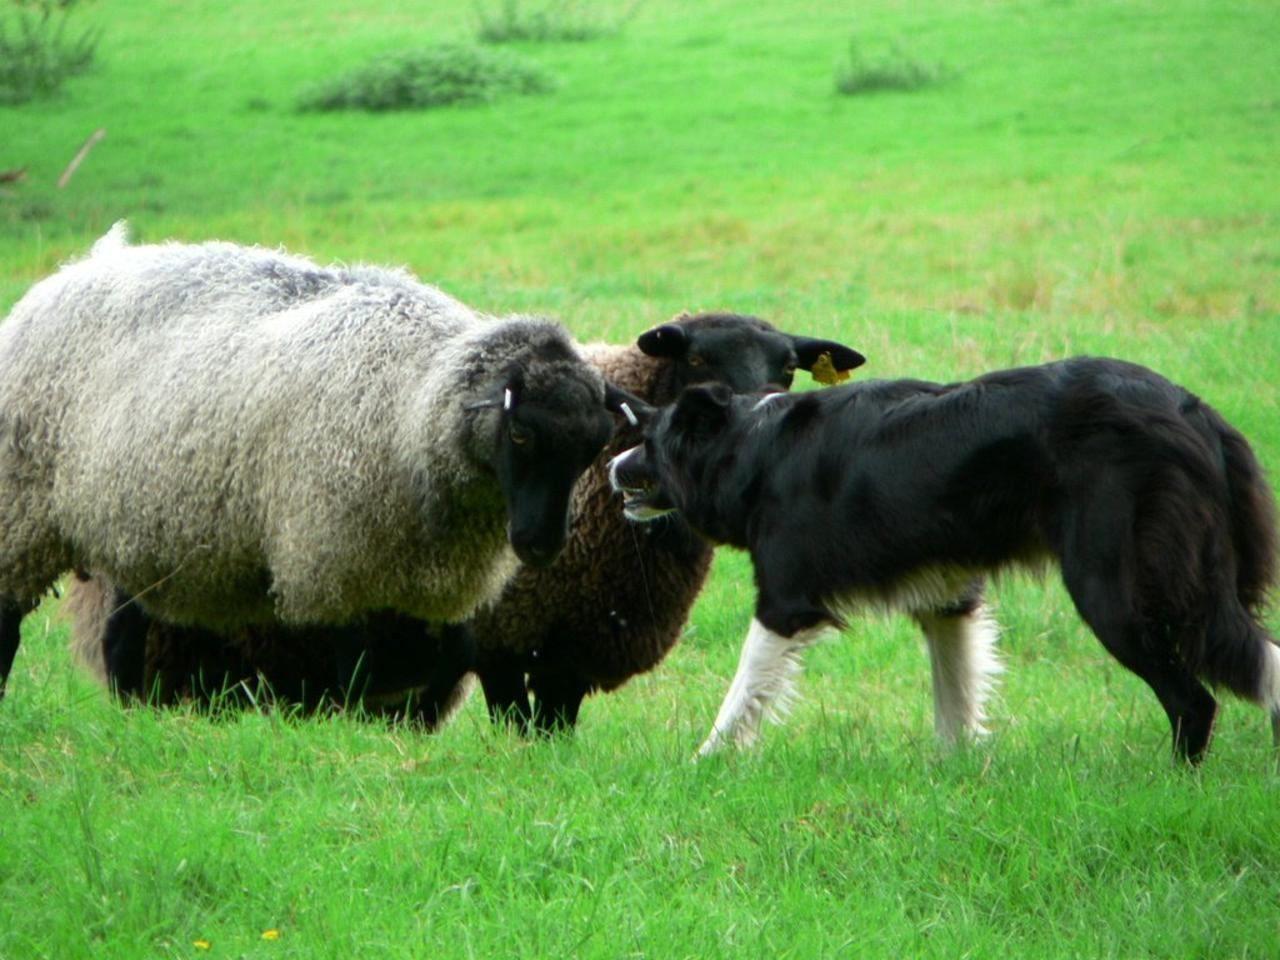 Dog Herding Sheep Into Kitchen In Uk